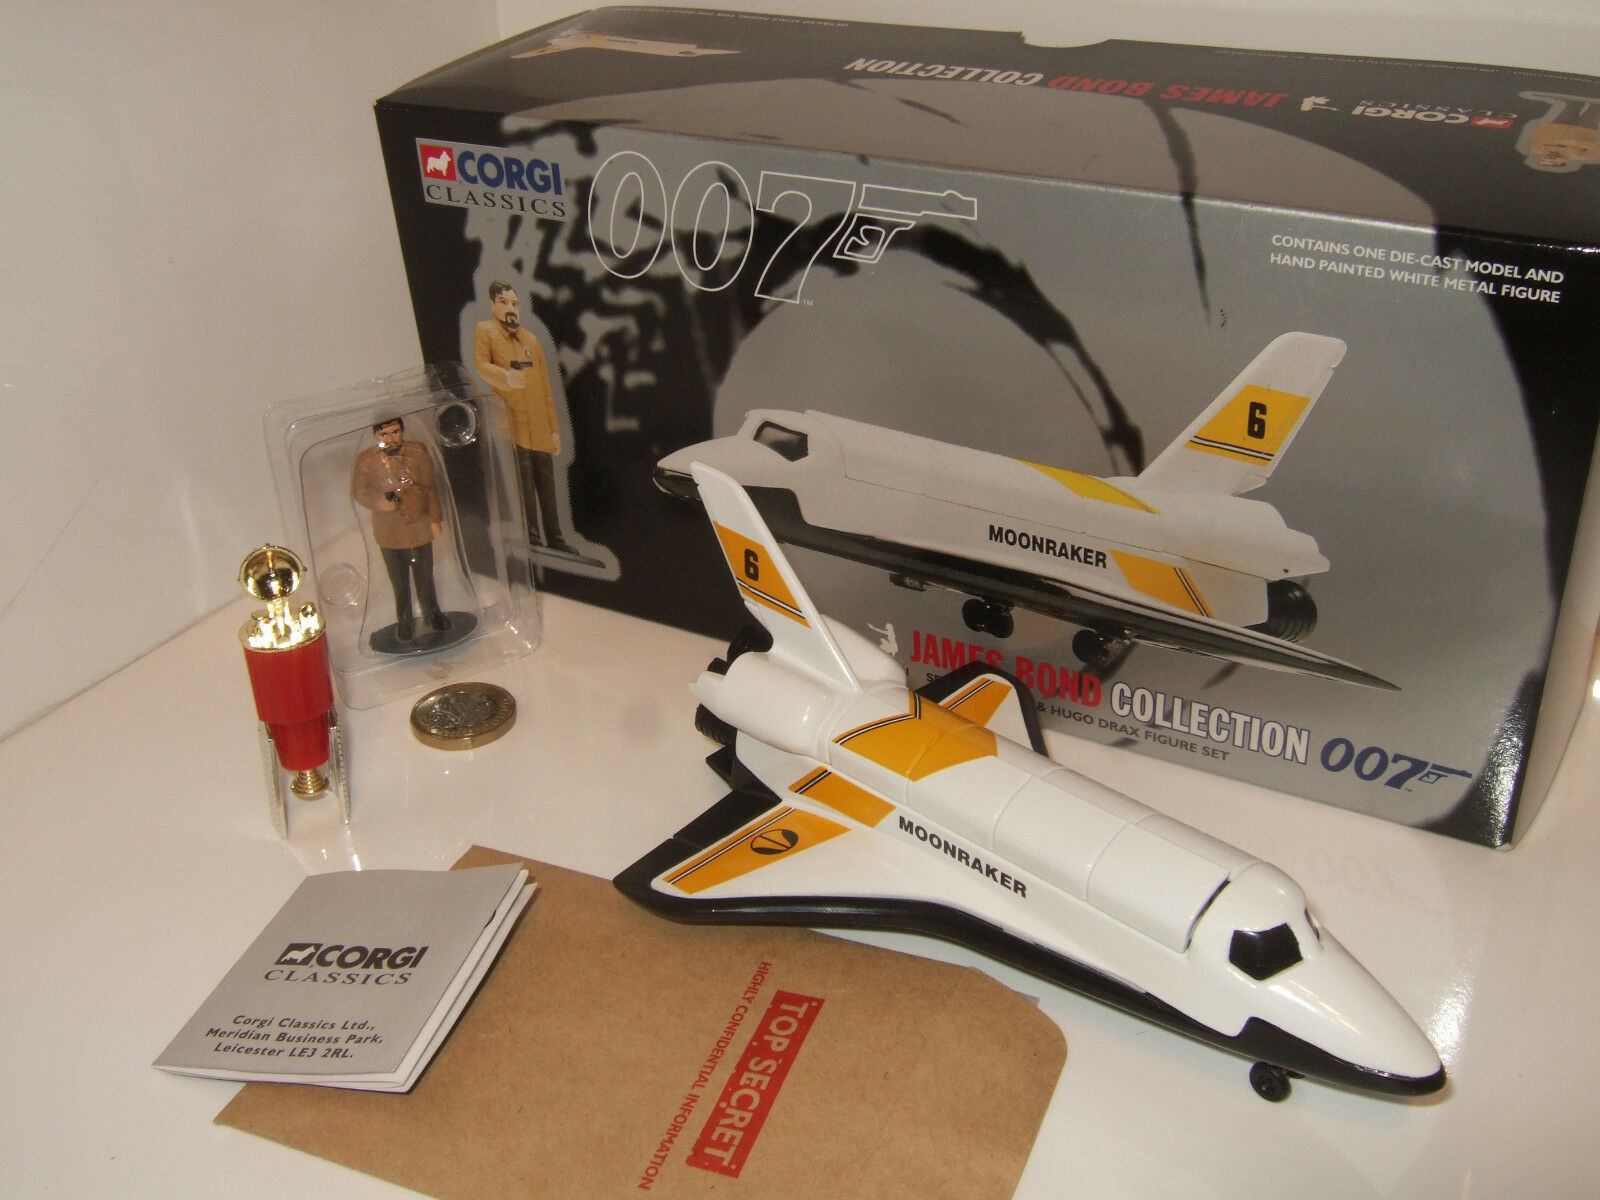 Corgi 65401 James Bond 007 Collection, Space Shuttle & Hugo Drax Figure Set